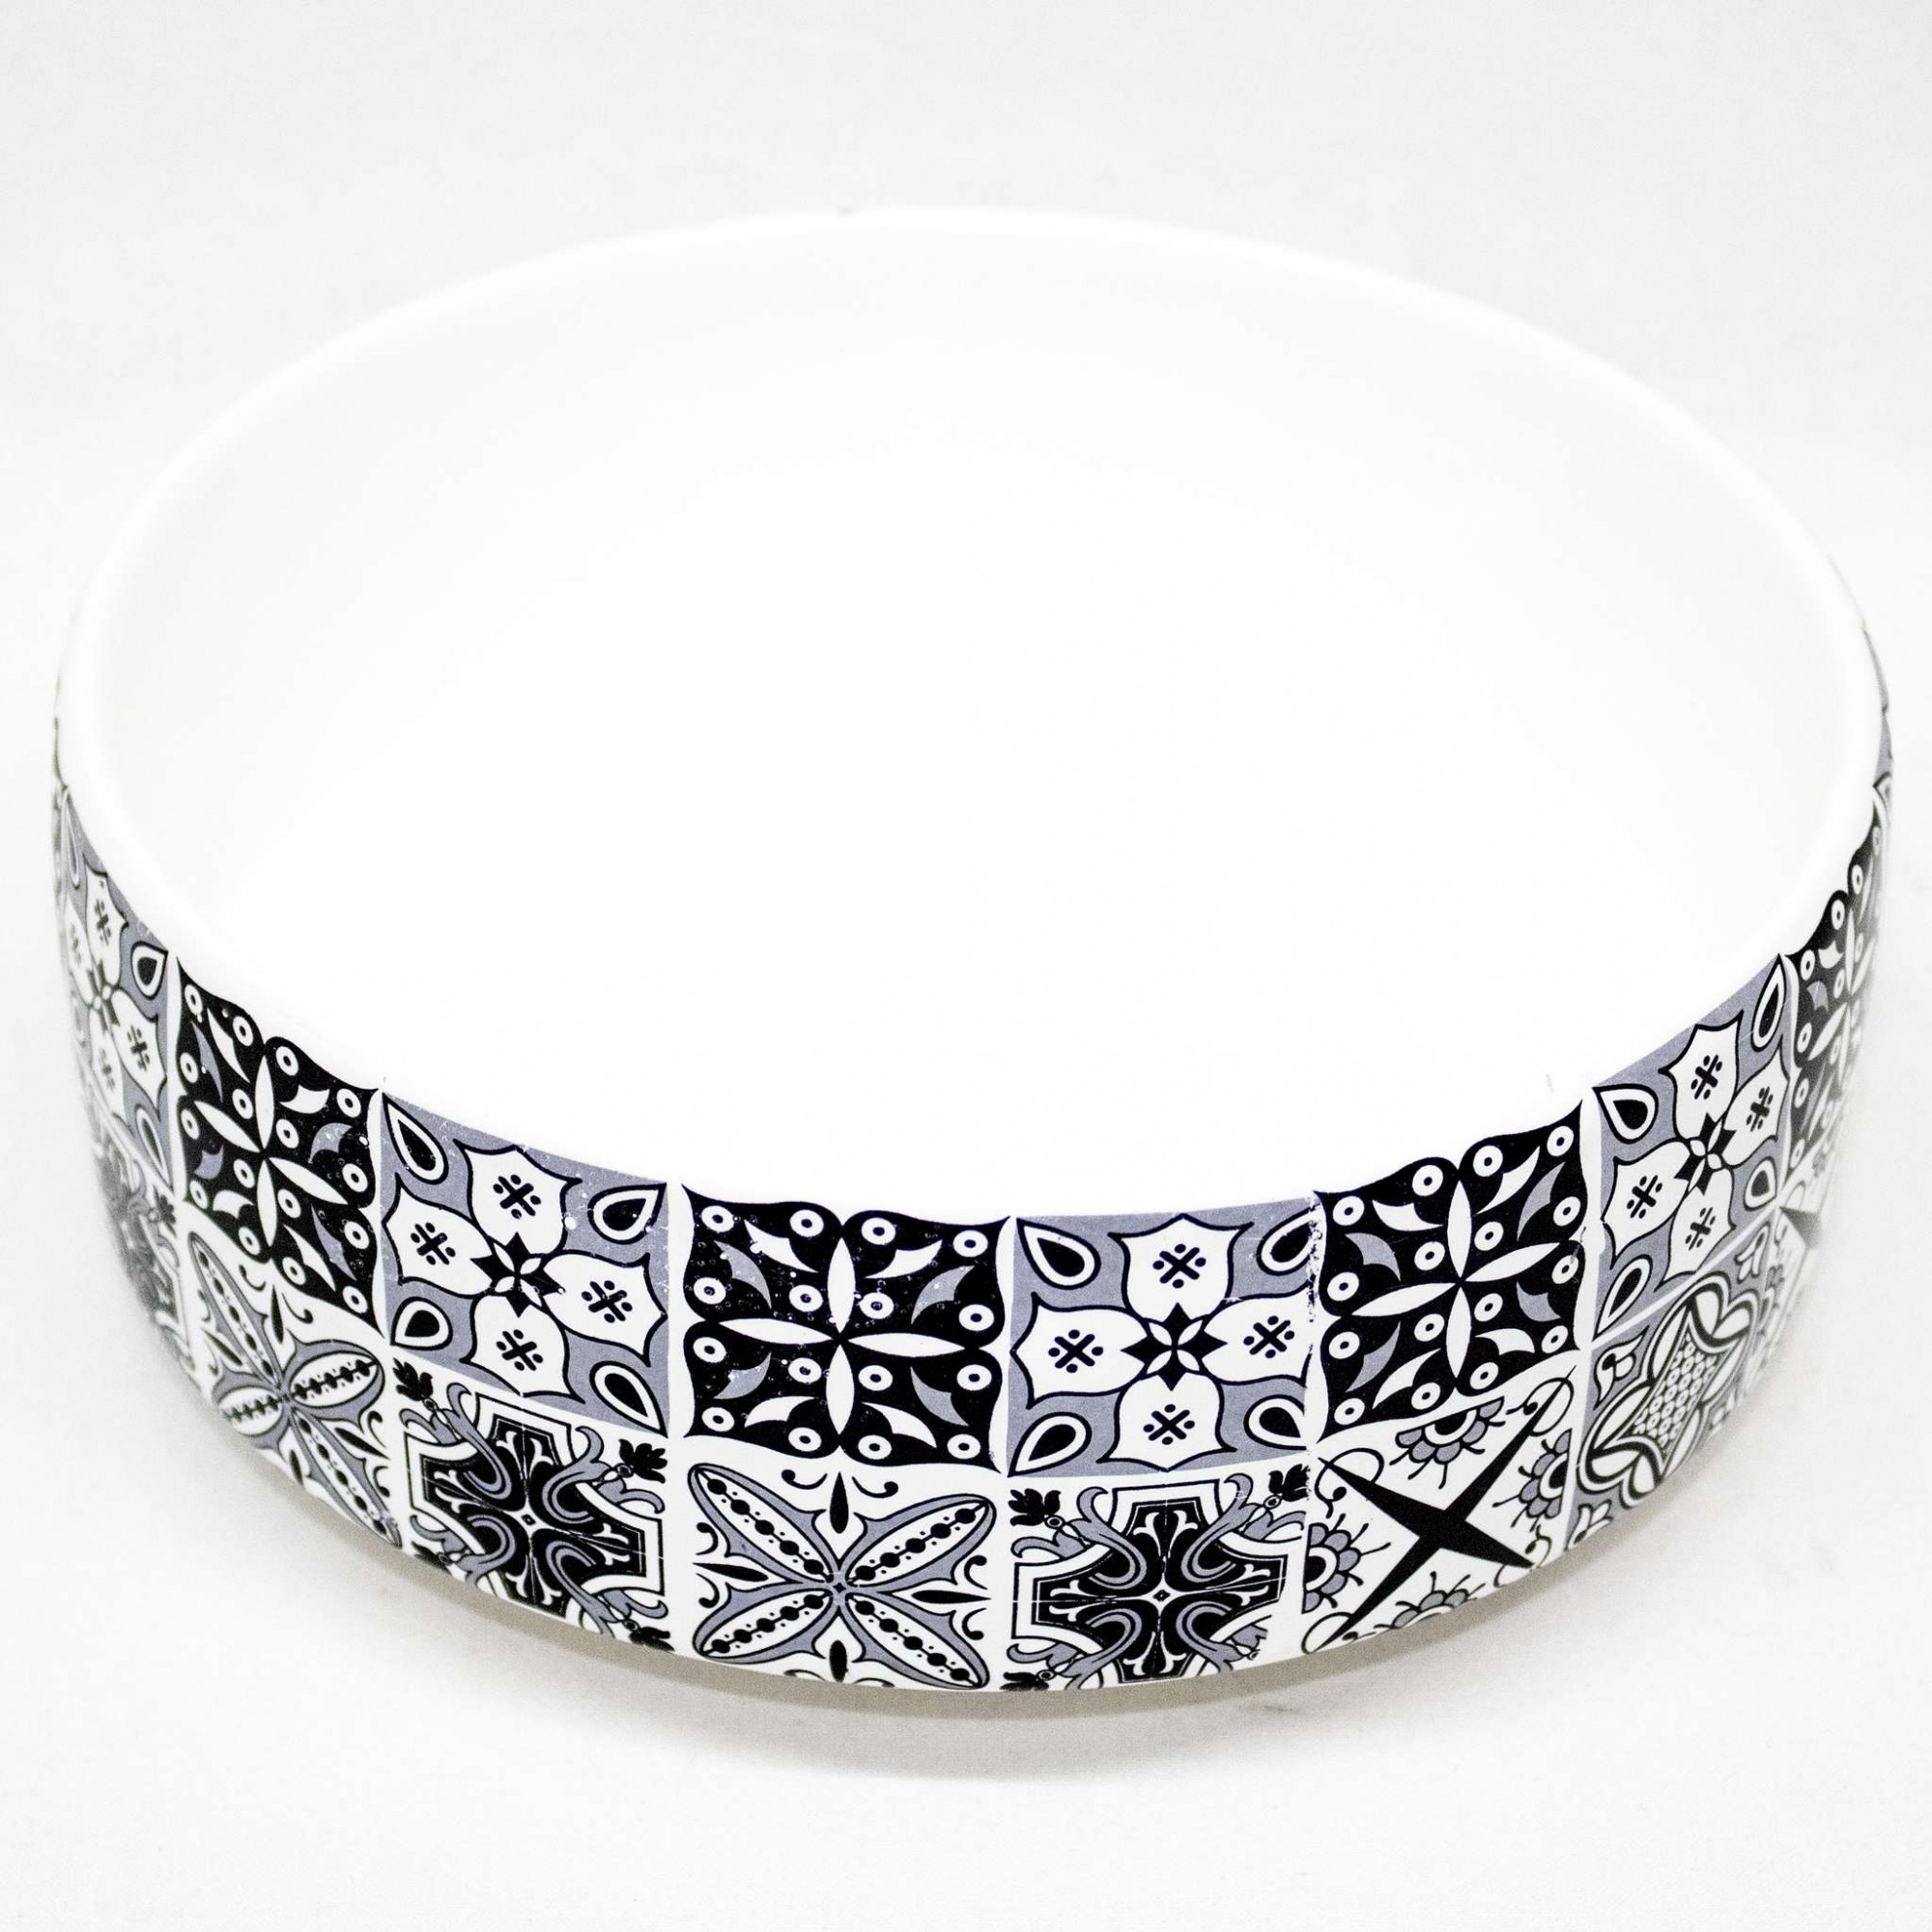 Vaso Equibana Redondo Pq - Cerâmica